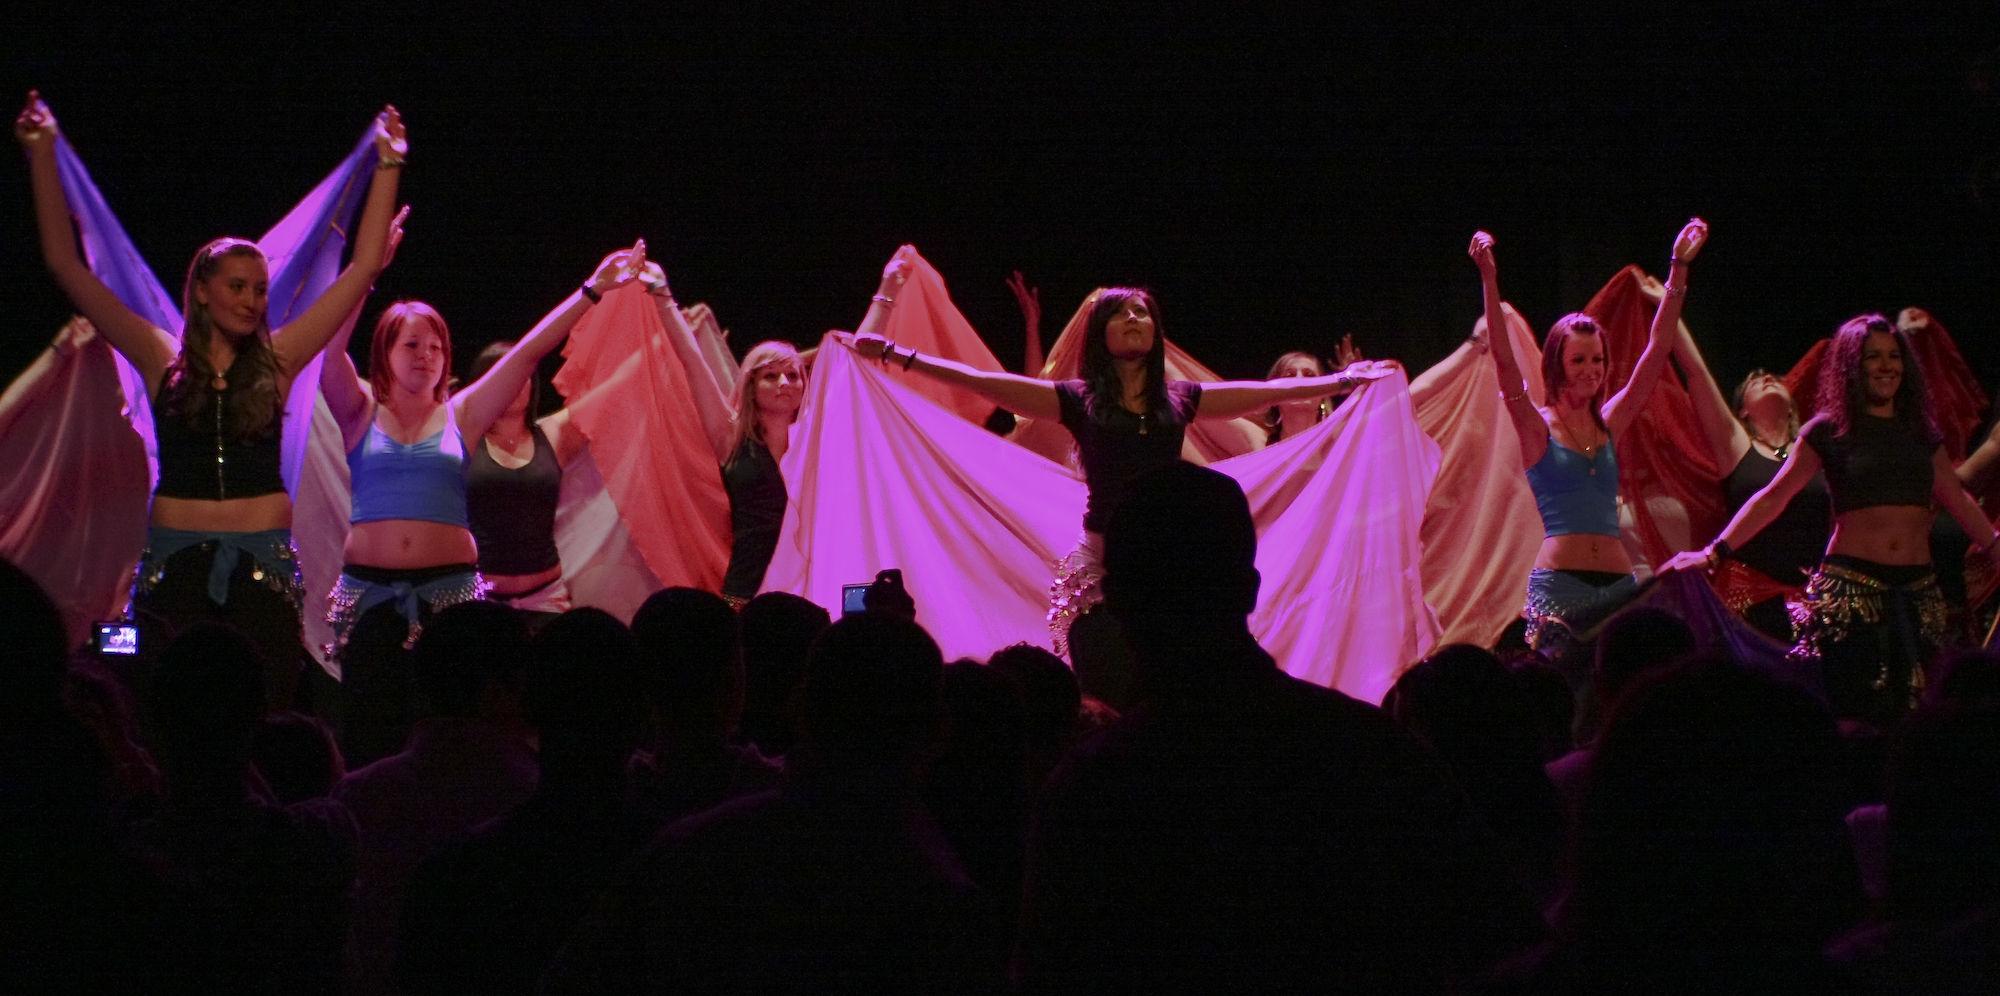 Atelier5-DanseOrientale-LeGrandMix-Quartiers2Lune2009-135